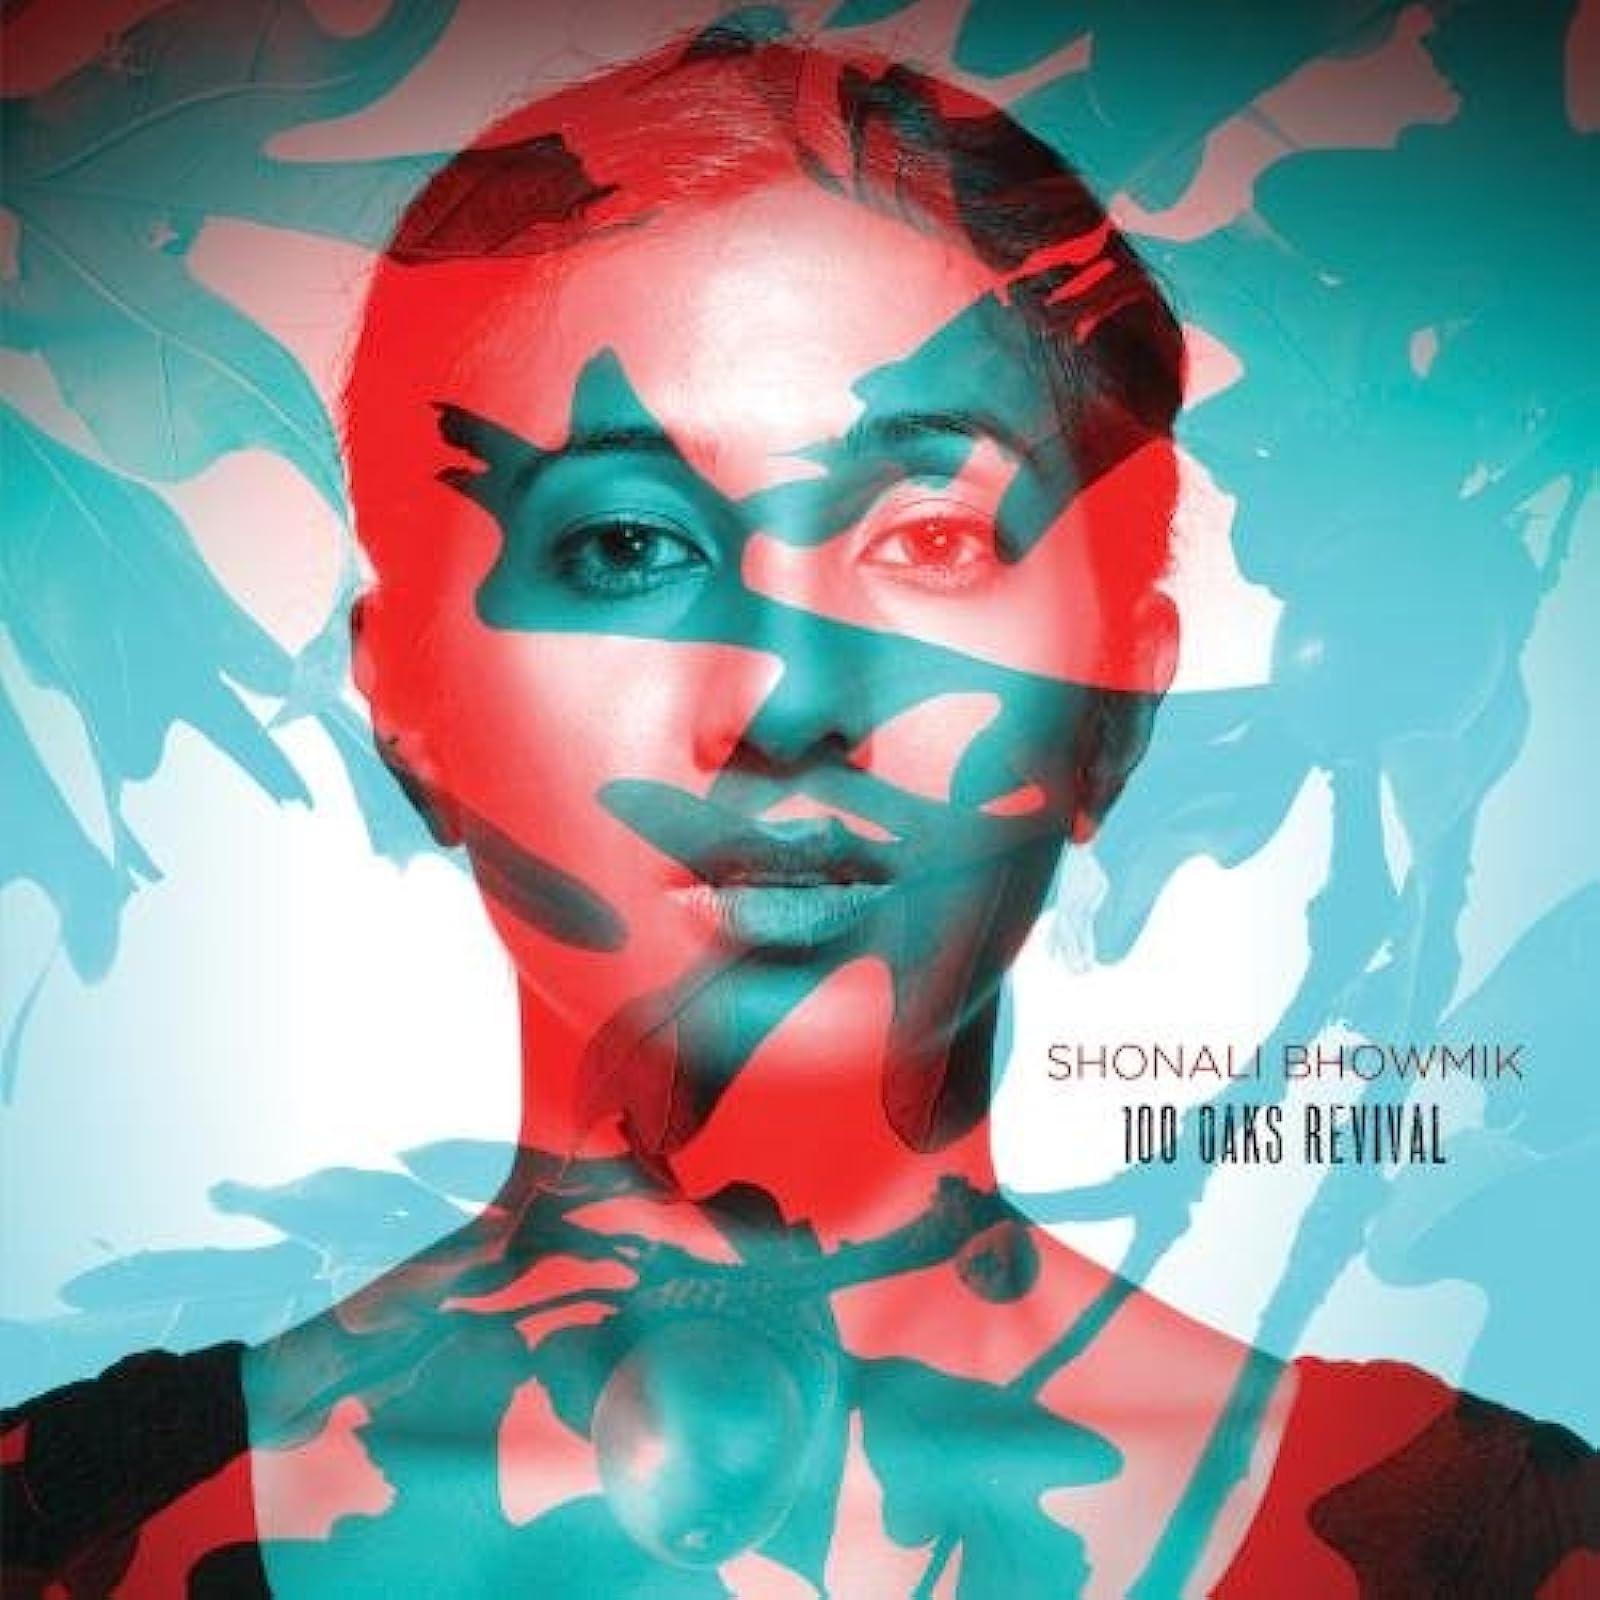 100 Oaks Revival By Shonali Bhowmik On Audio CD Album 2011